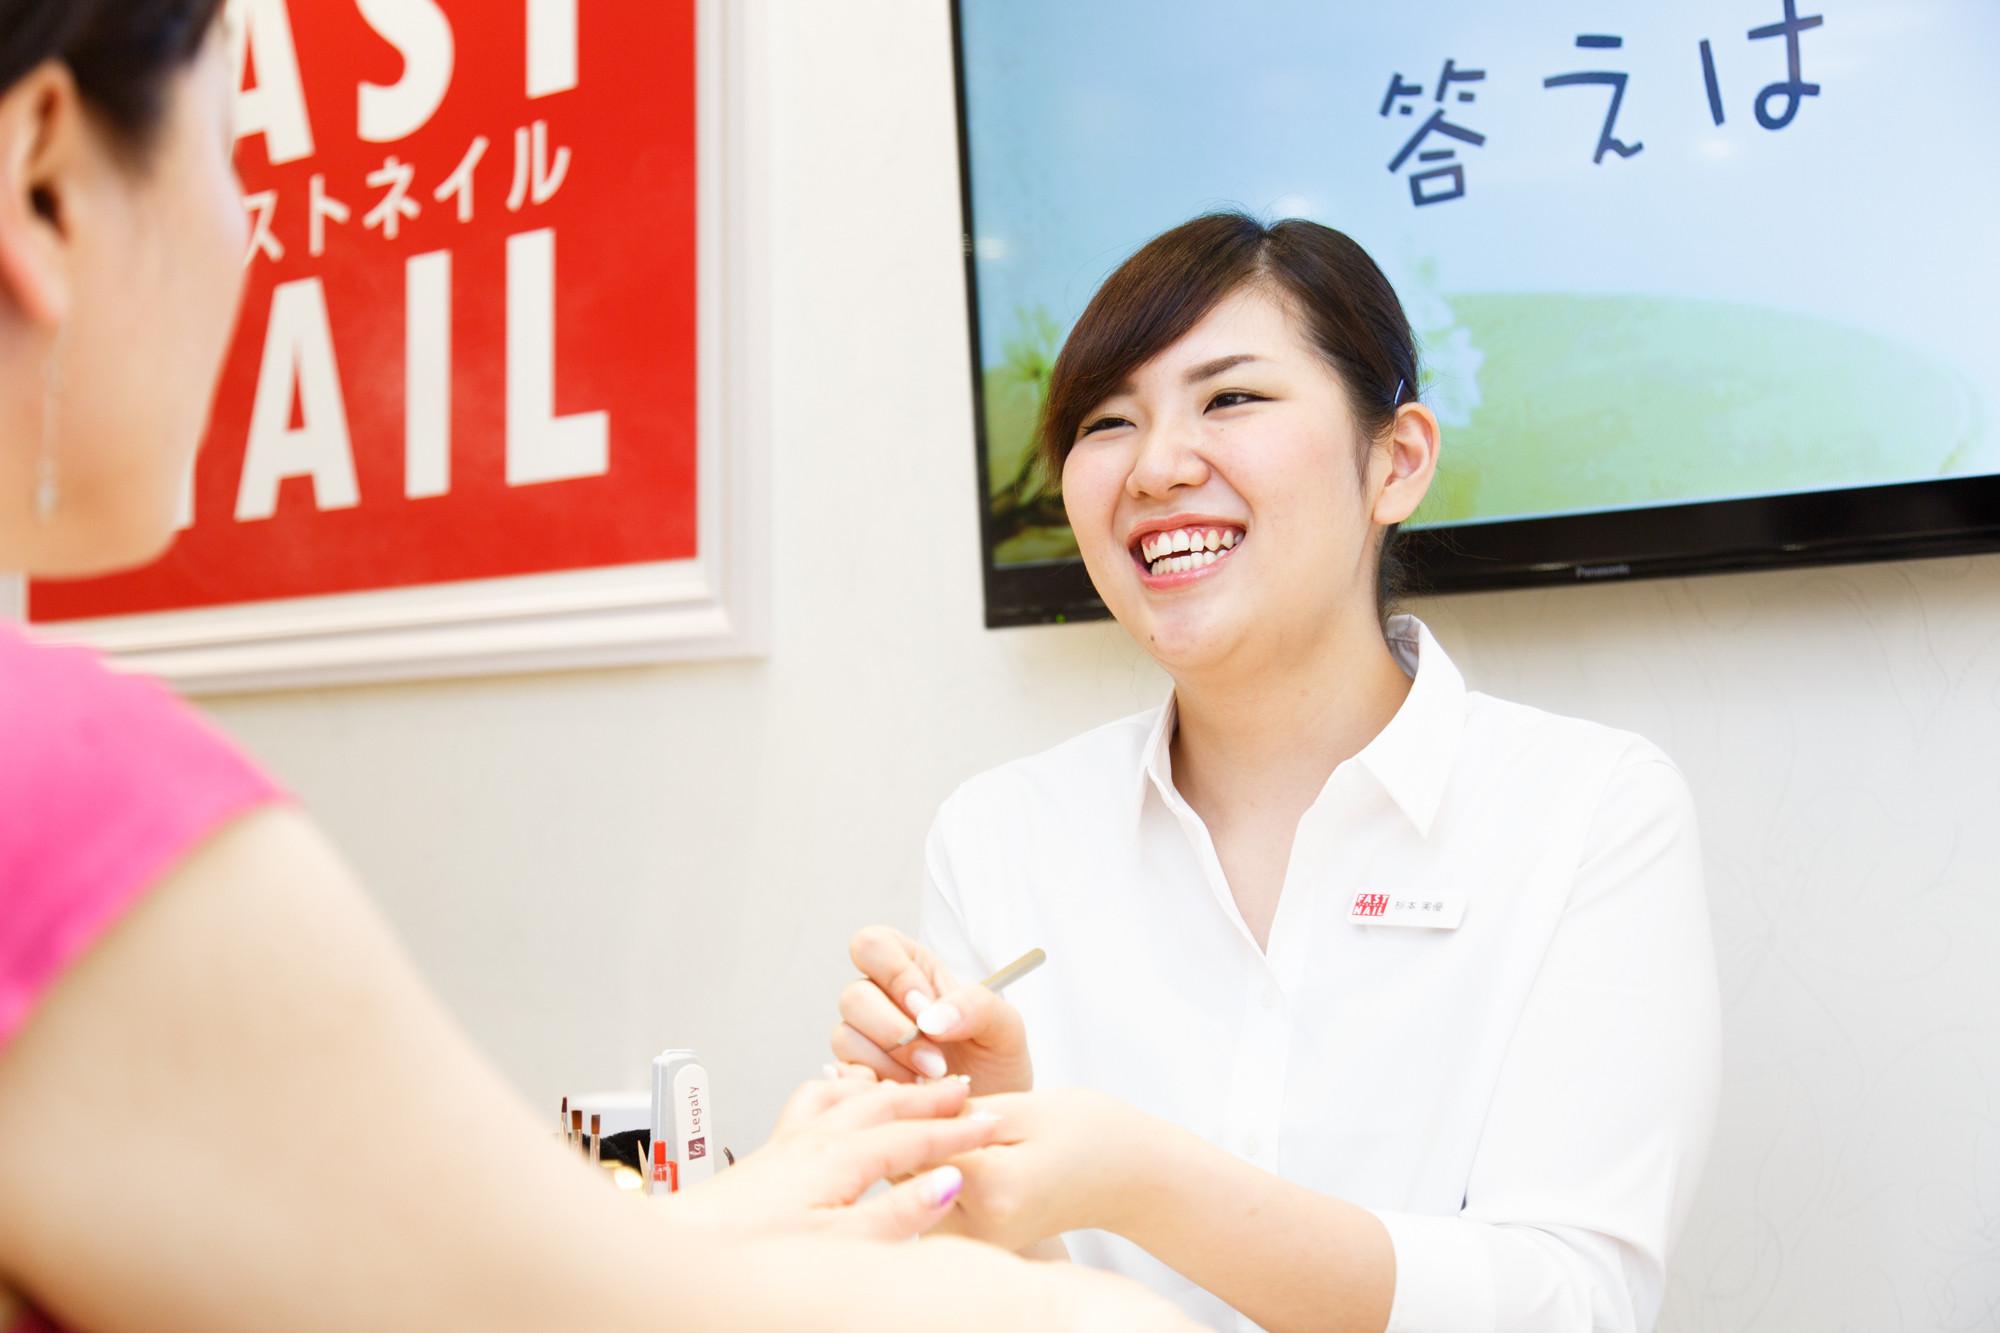 FASTNAIL(ファストネイル) 南大沢店 のアルバイト情報